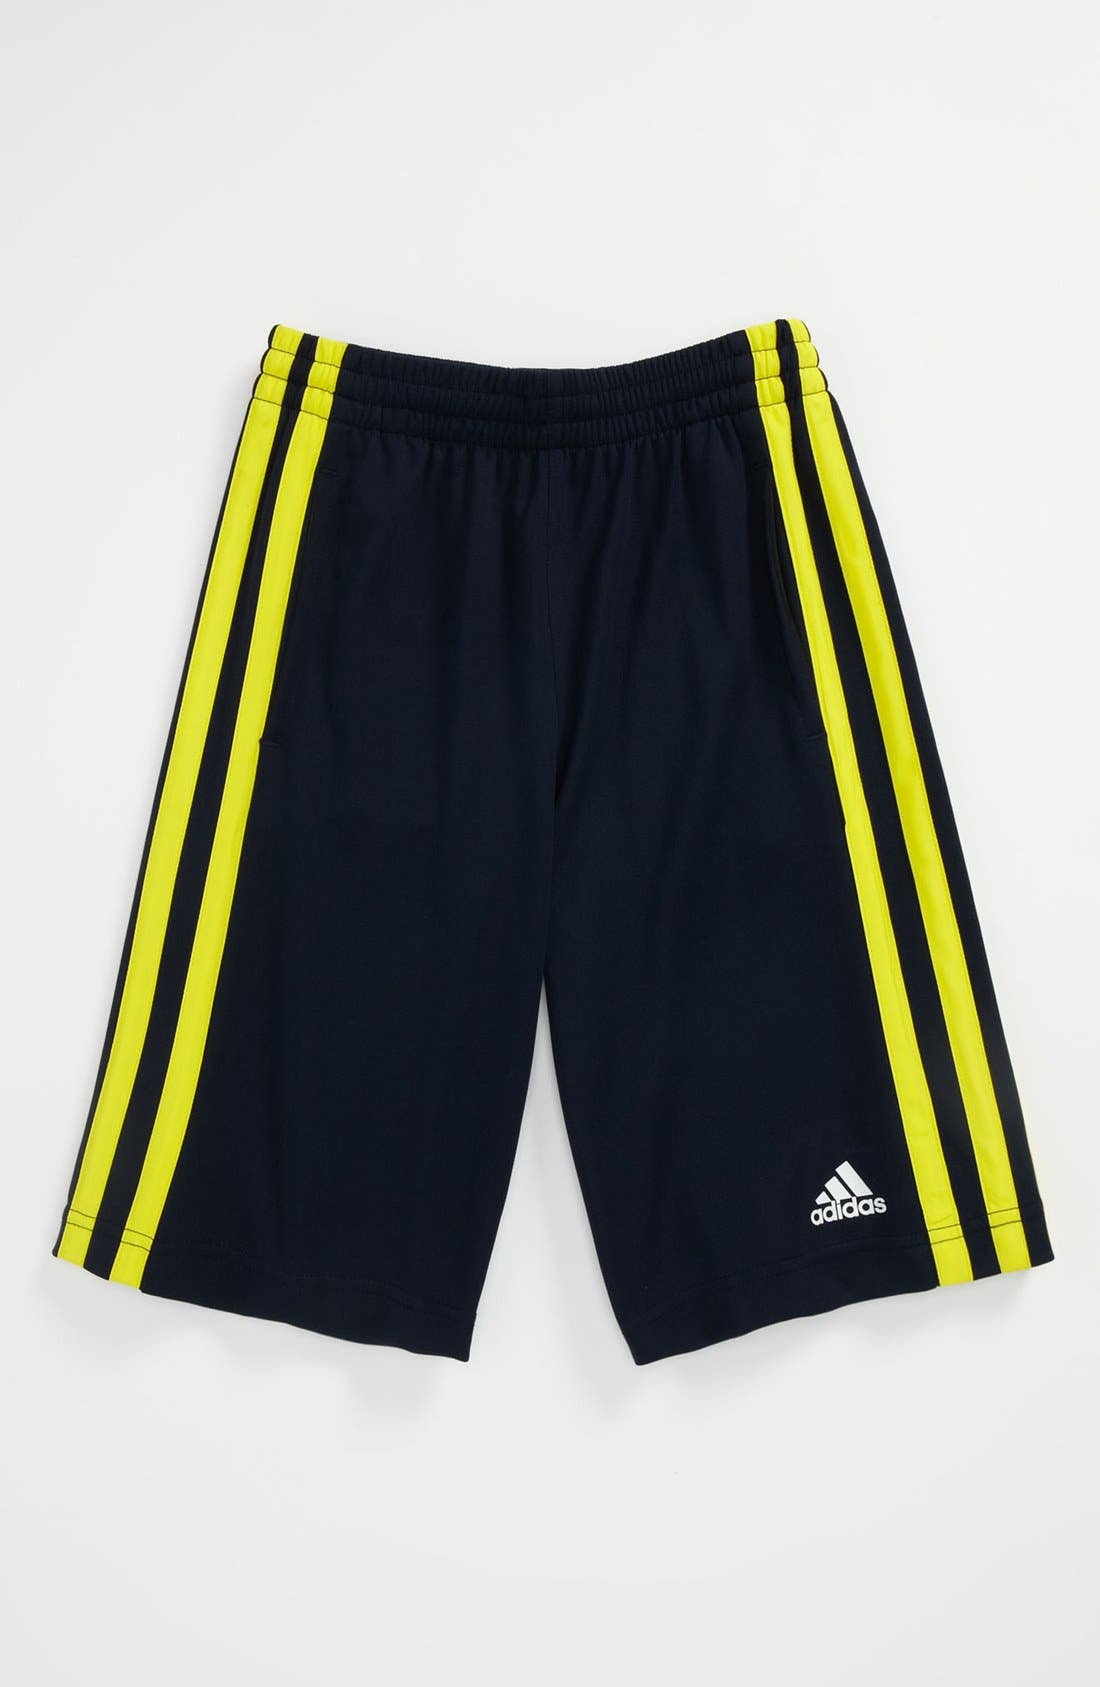 Main Image - adidas 'Fat Stripes' Shorts (Big Boys)